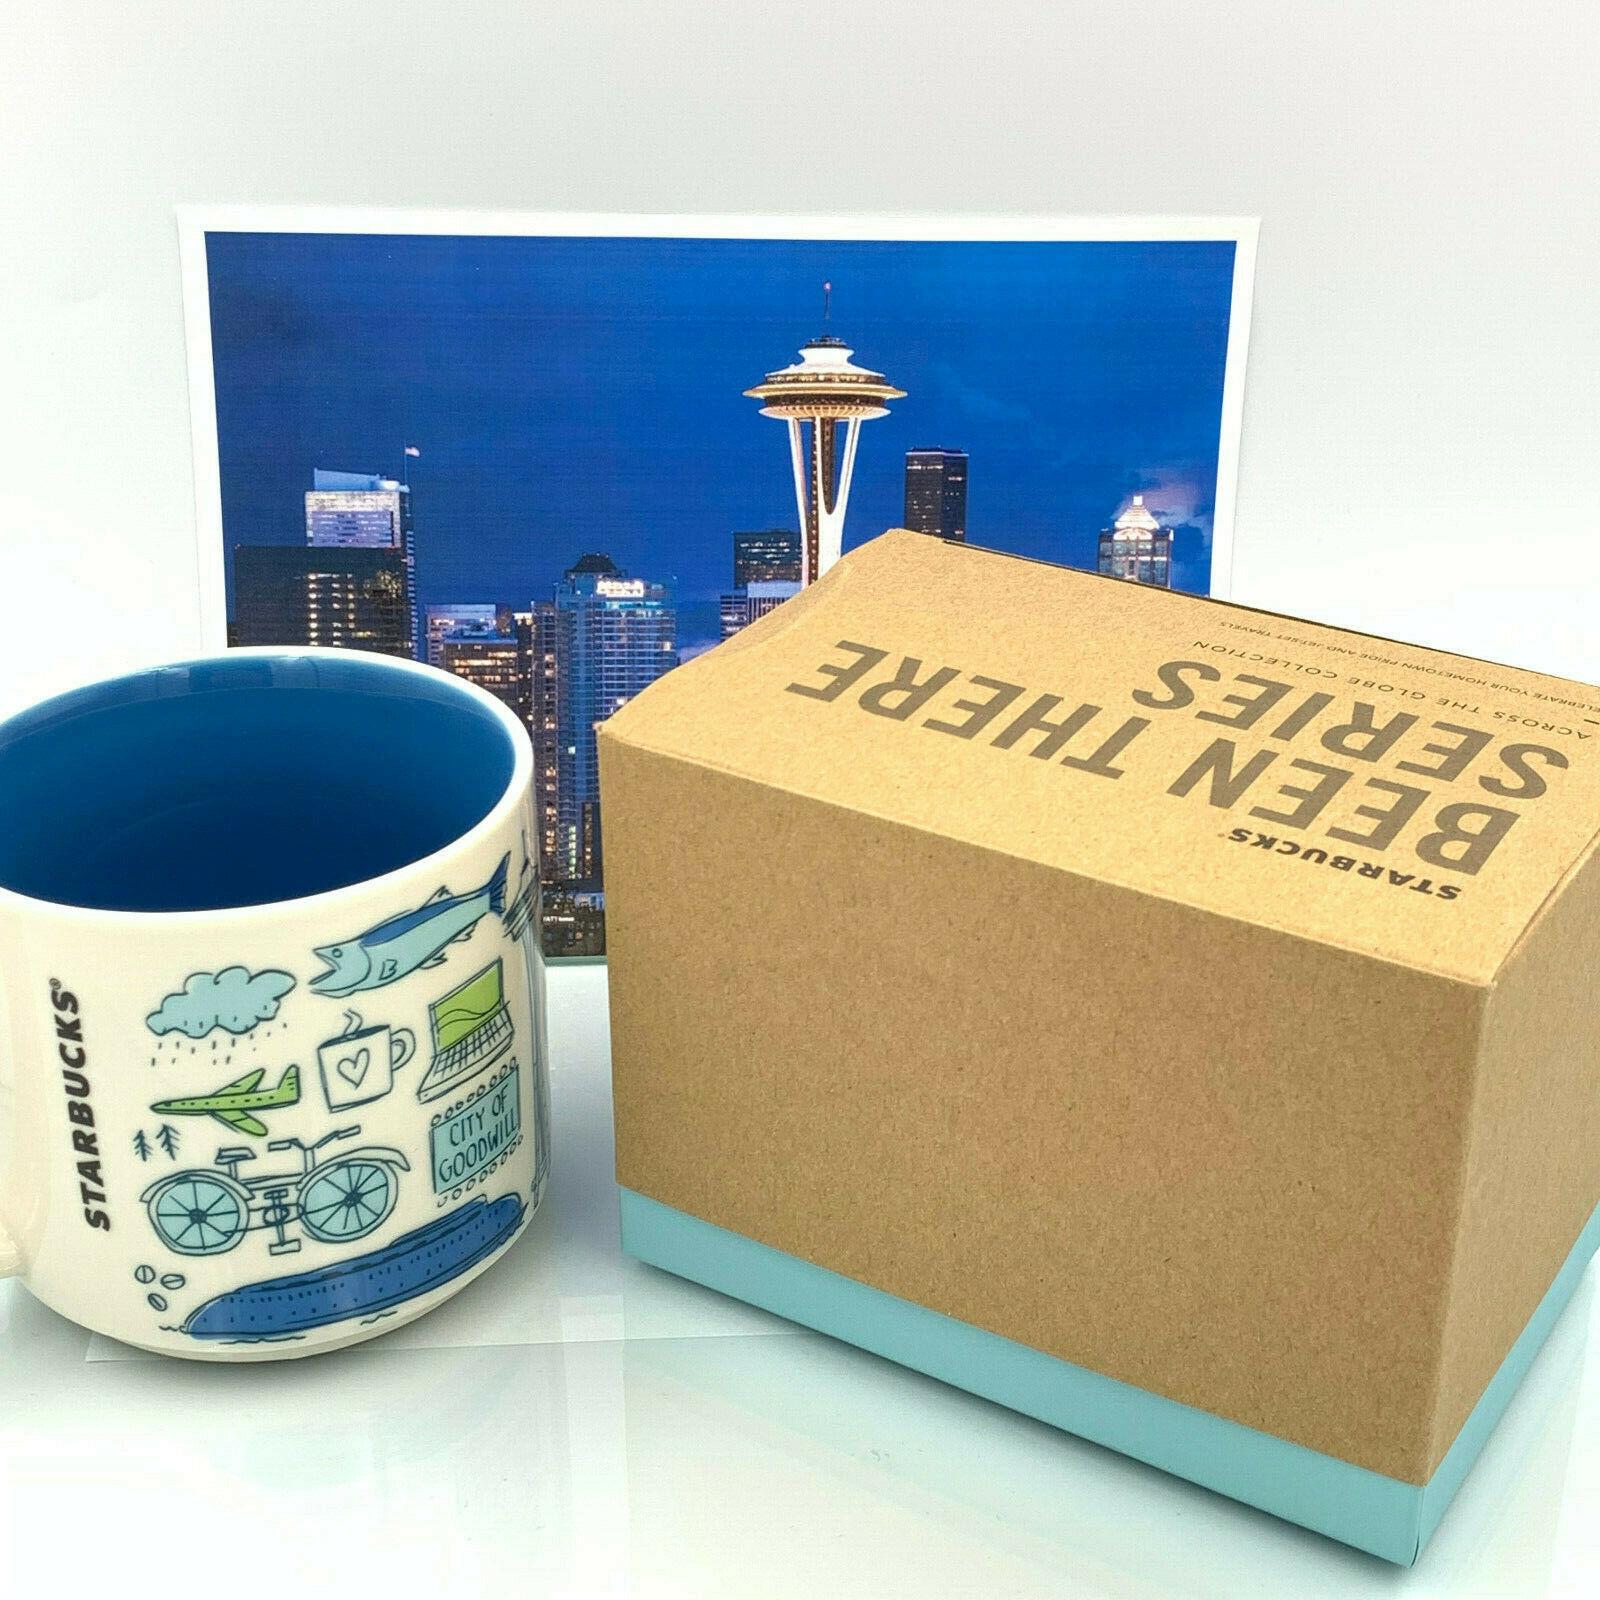 Starbucks Coffee Ceramic Mug Cup USA World Collection Coffee Tea Hot 14 oz Gift image 3